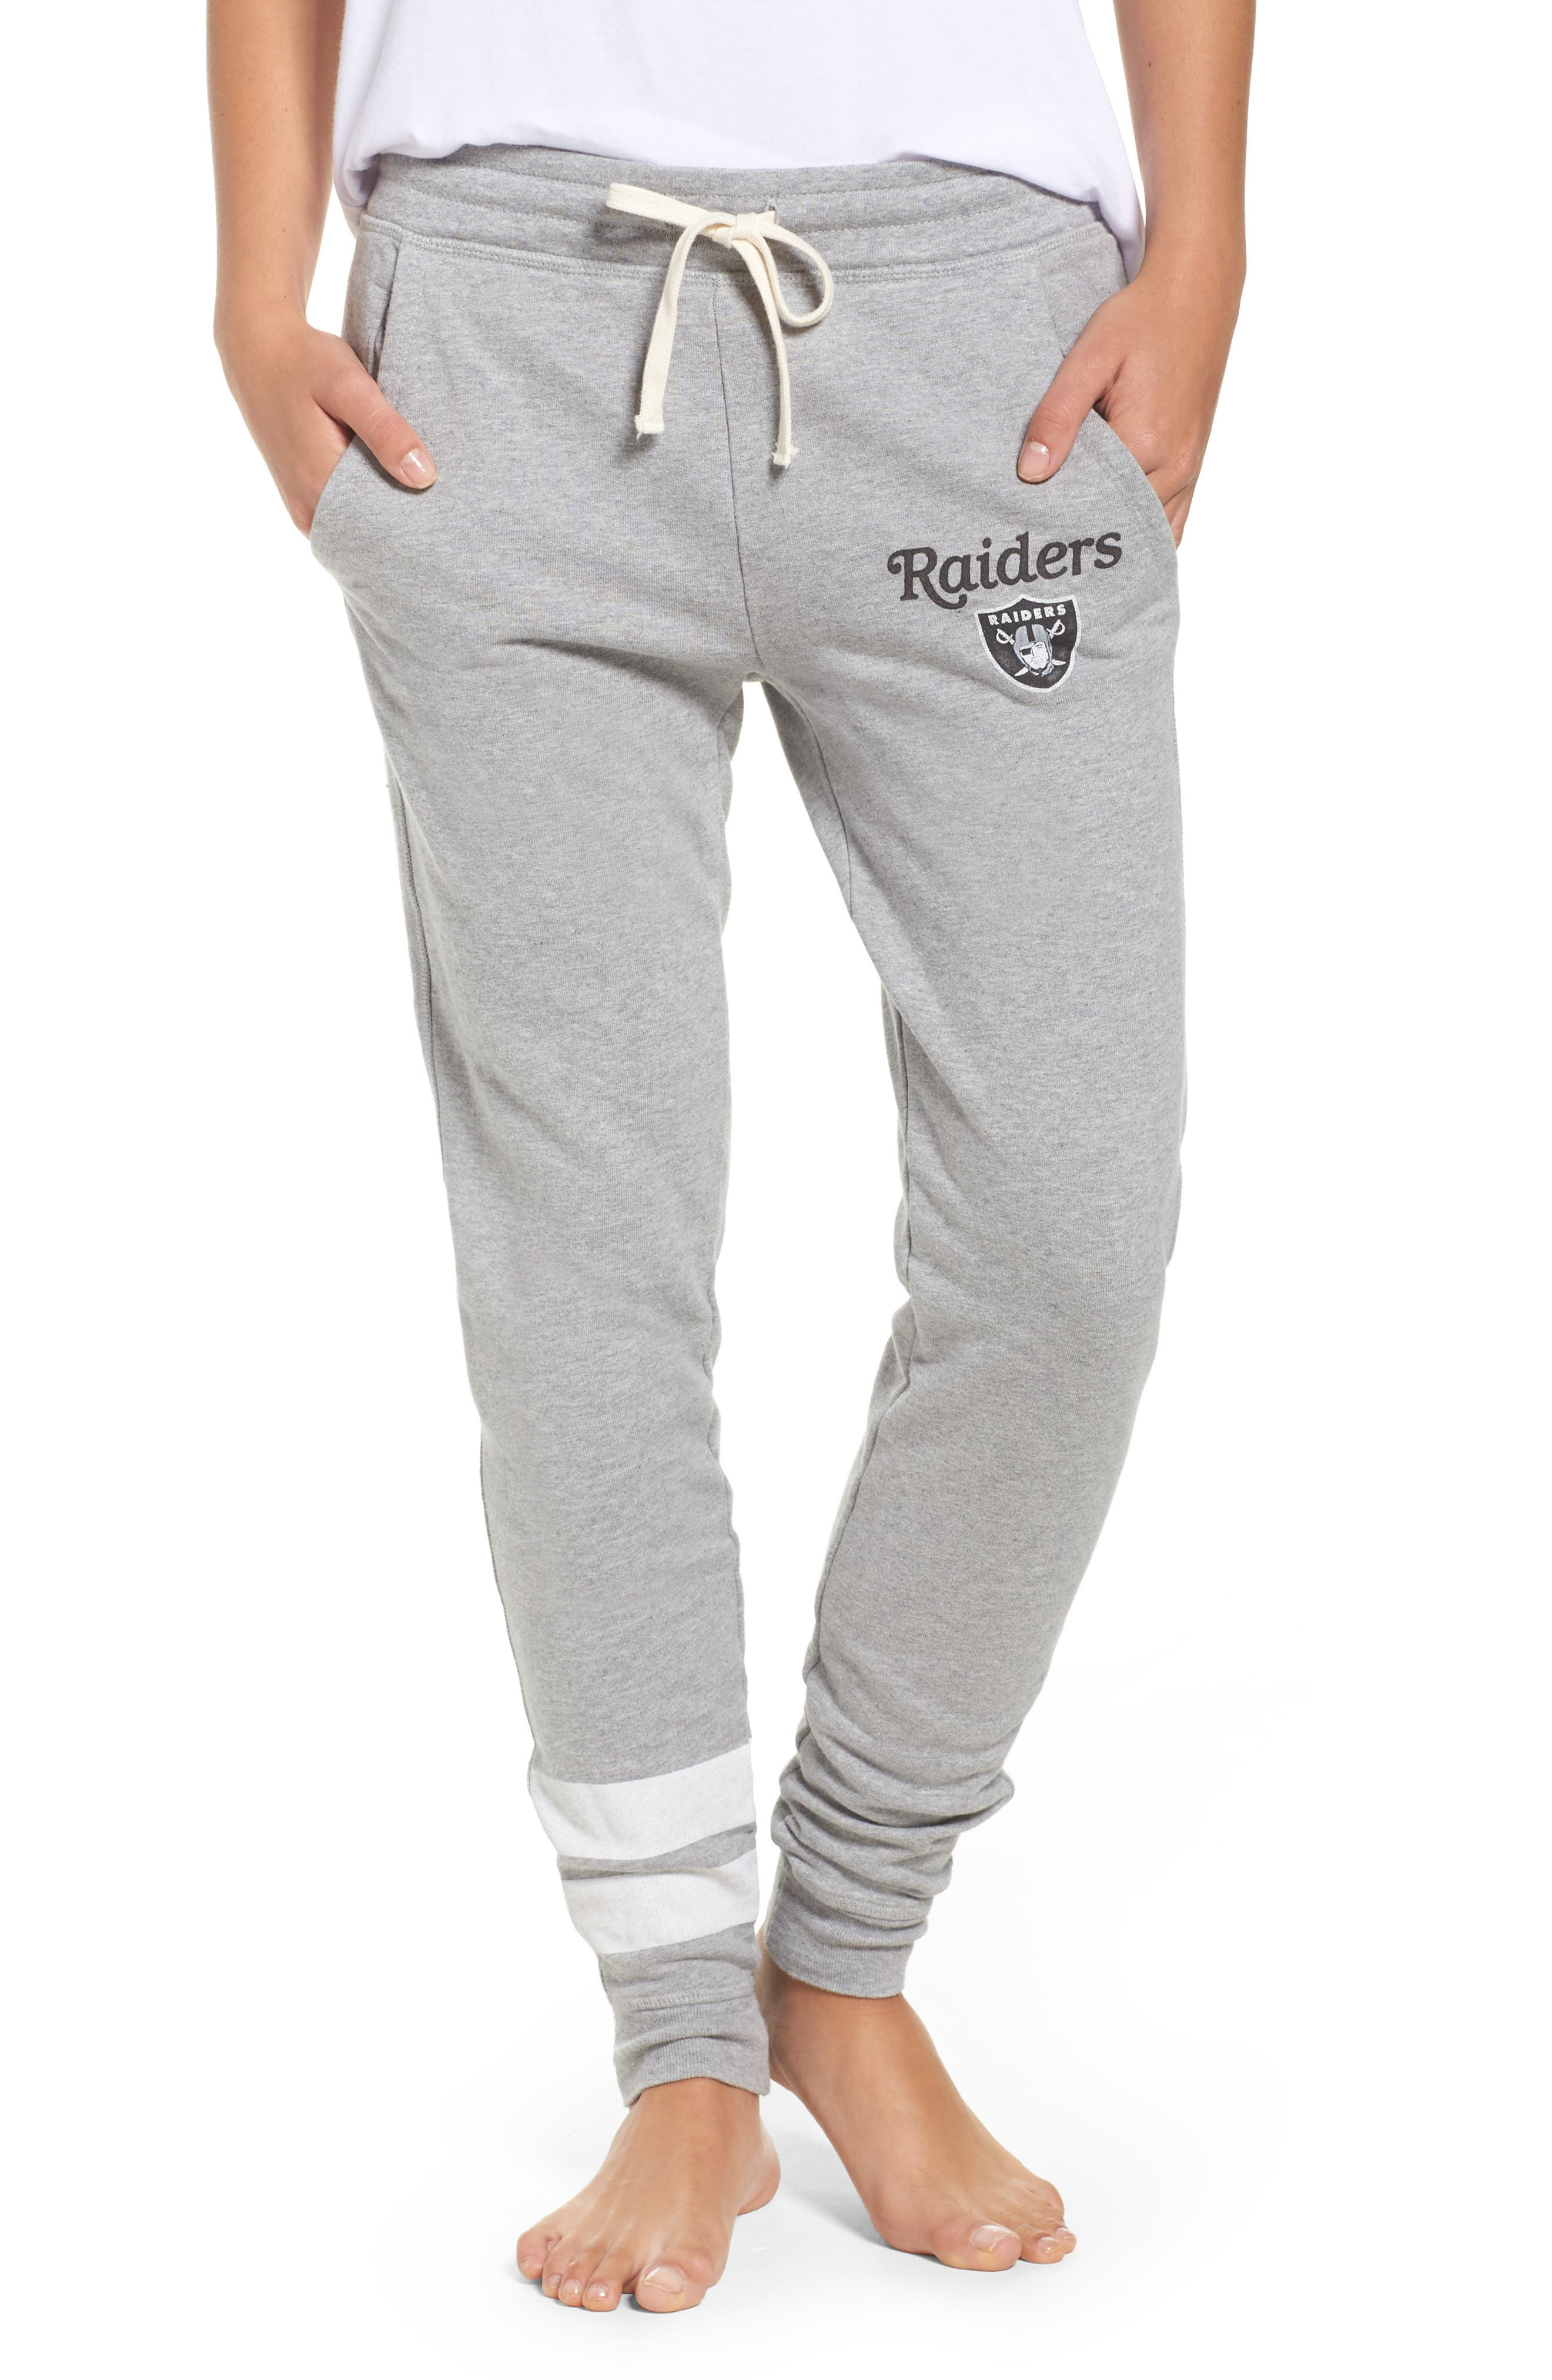 NFL Oakland Raiders Sweatpants,                         Main,                         color, 028